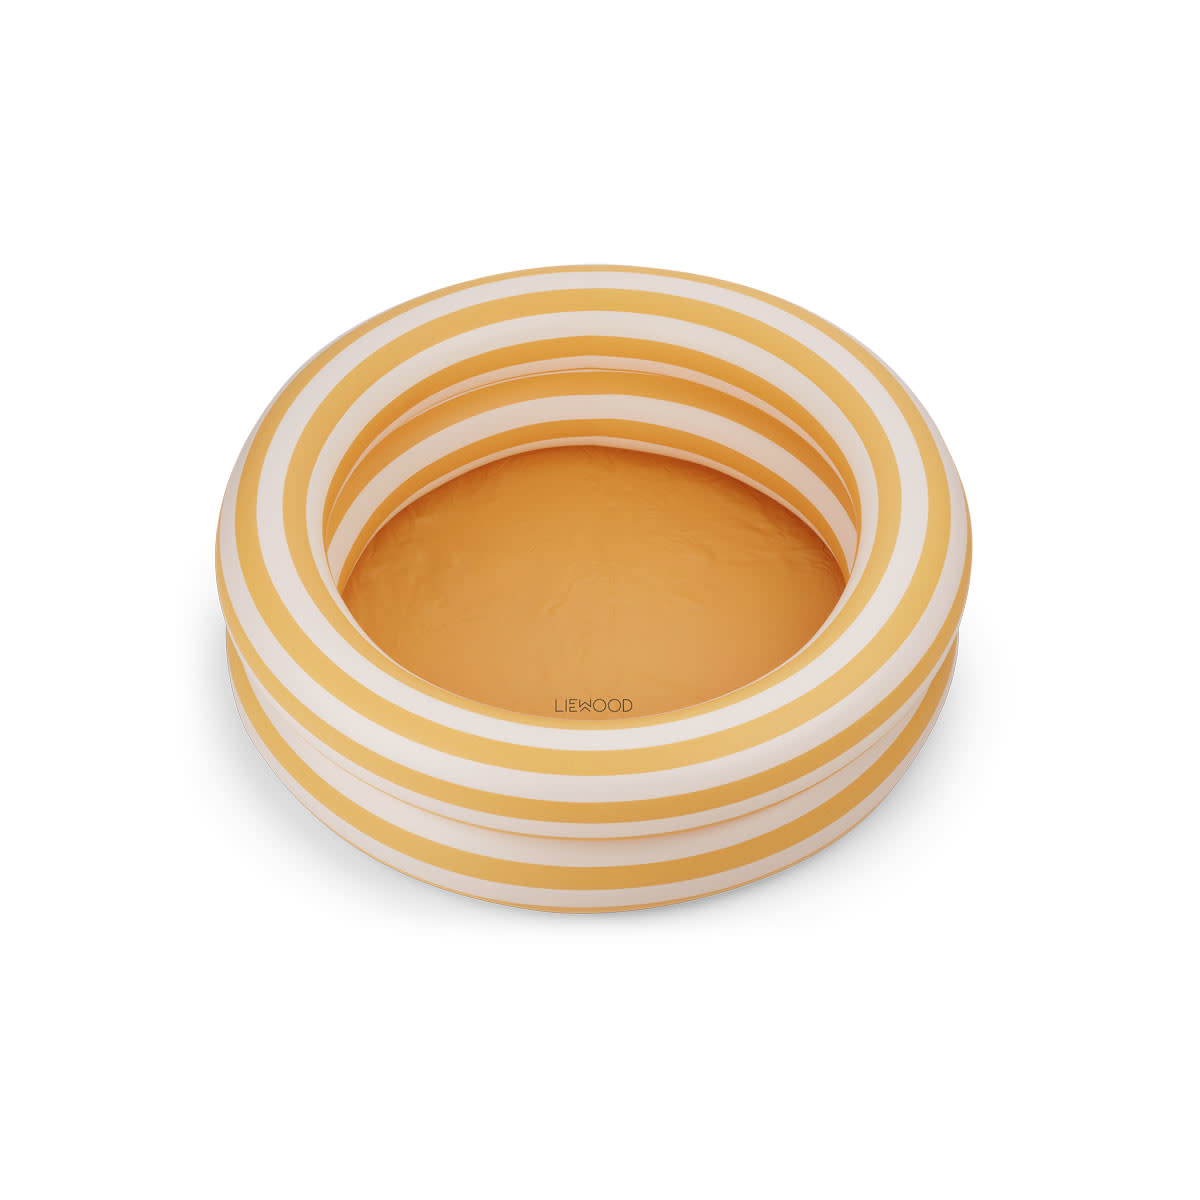 Leonore pool stripe yellow mellow-1